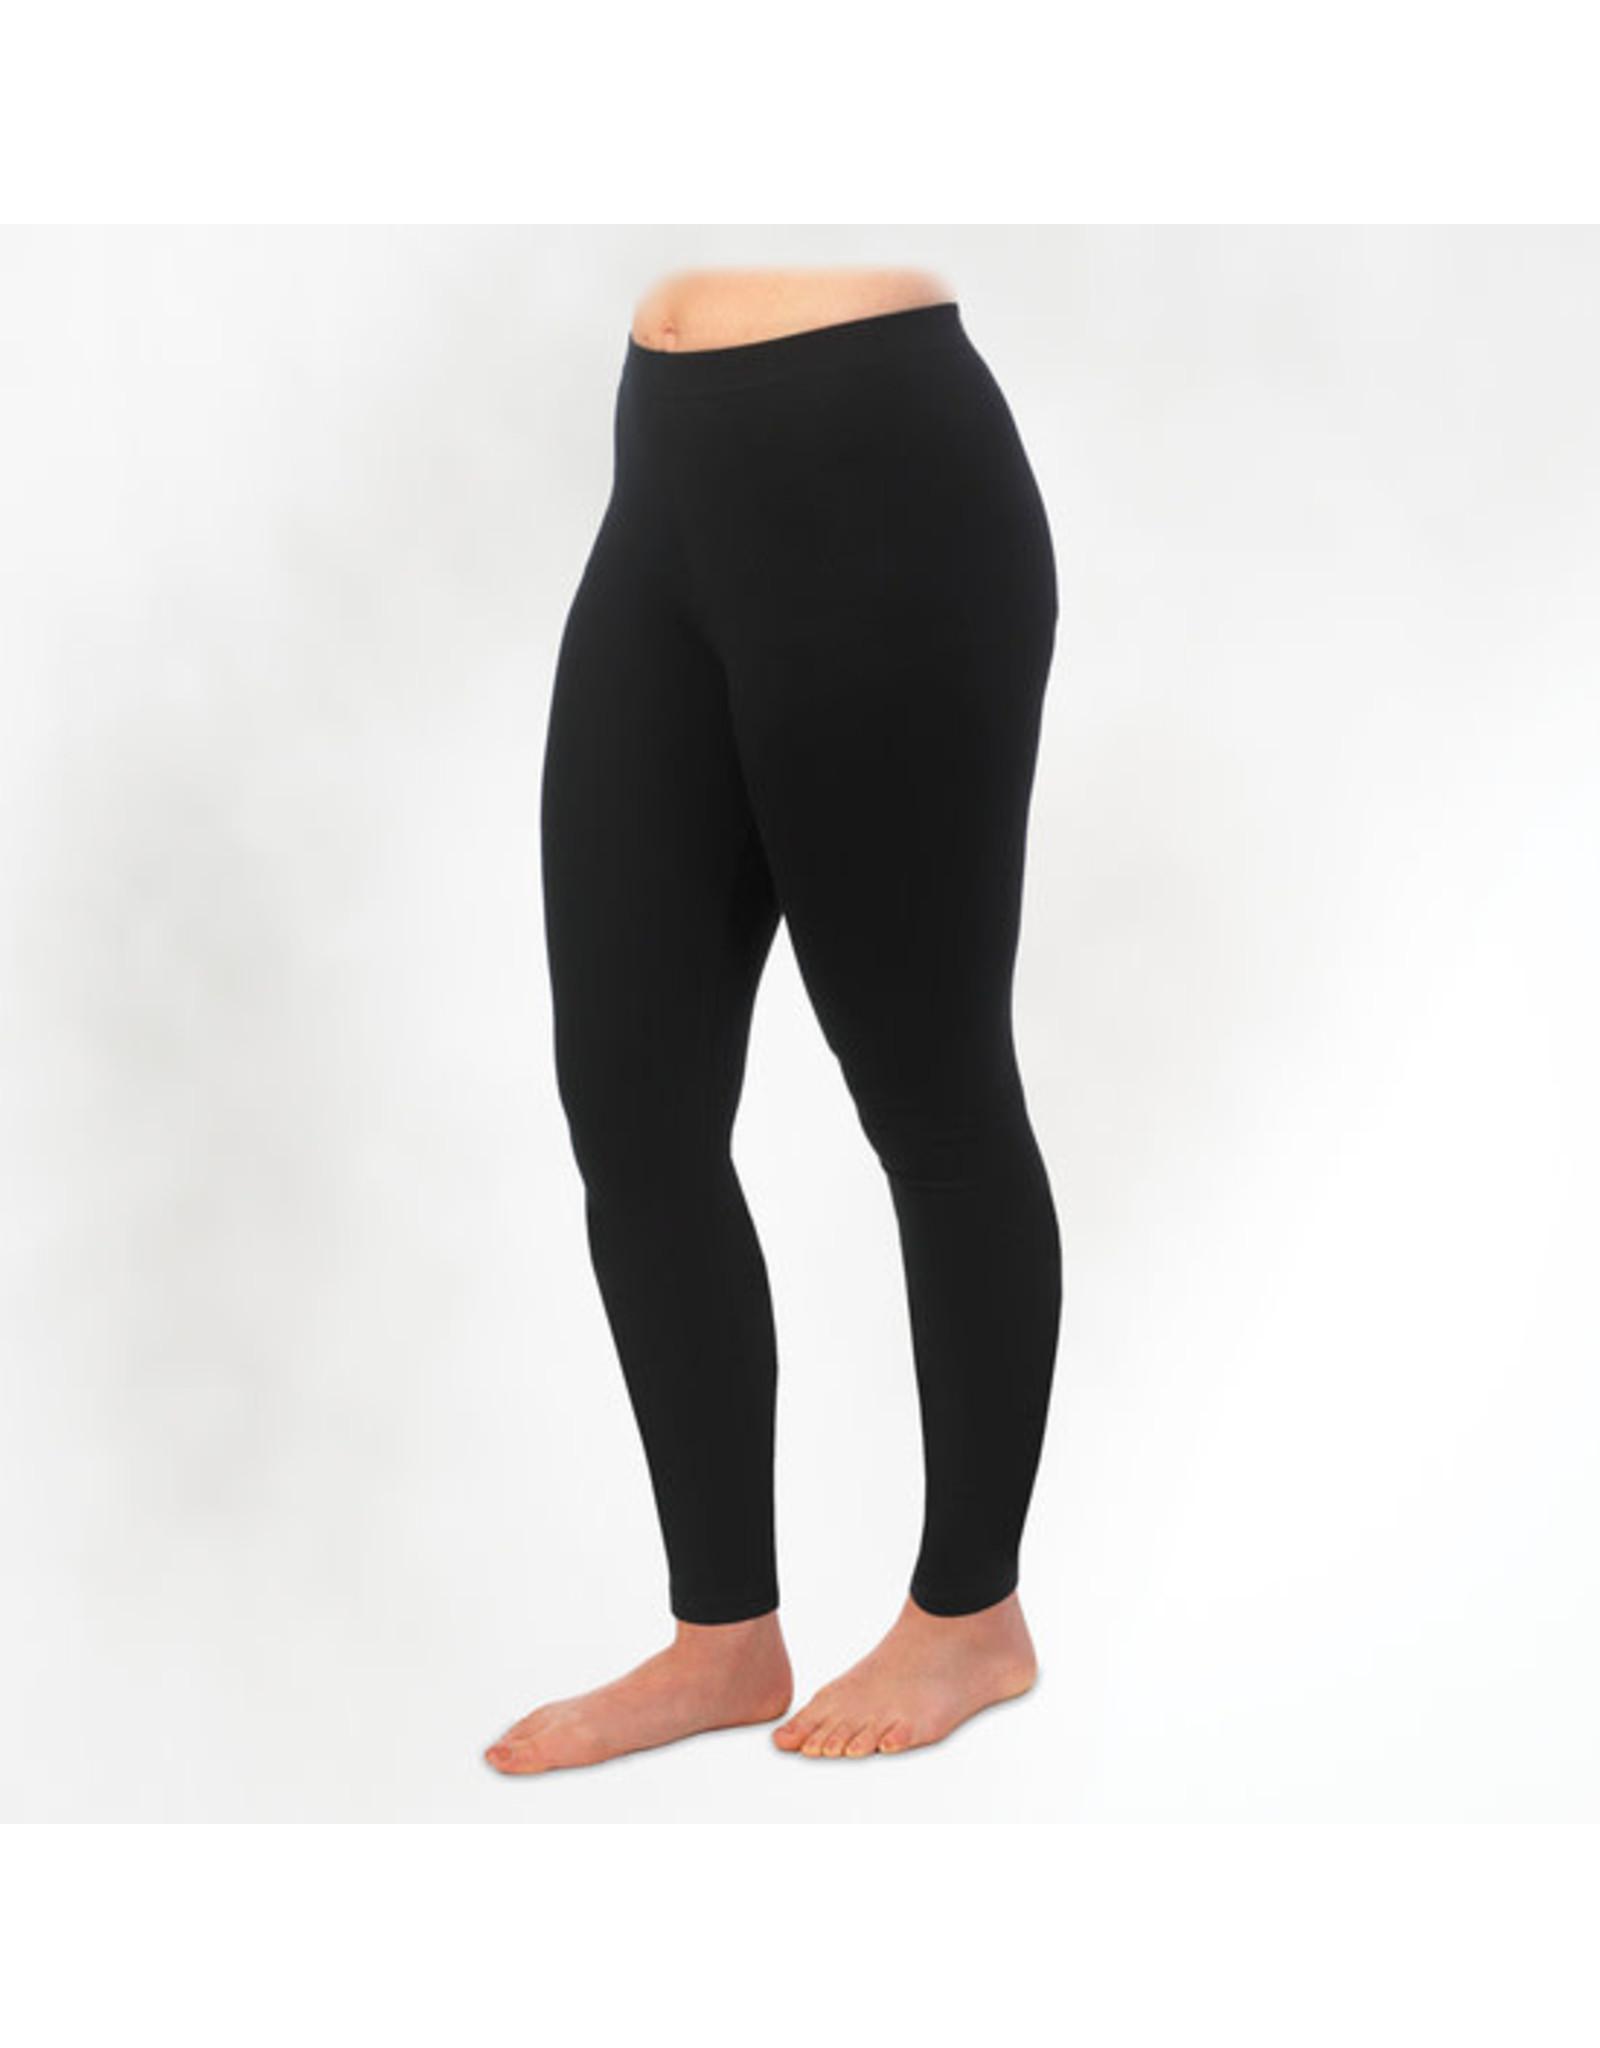 Organic Cotton Ankle Legging, Black.